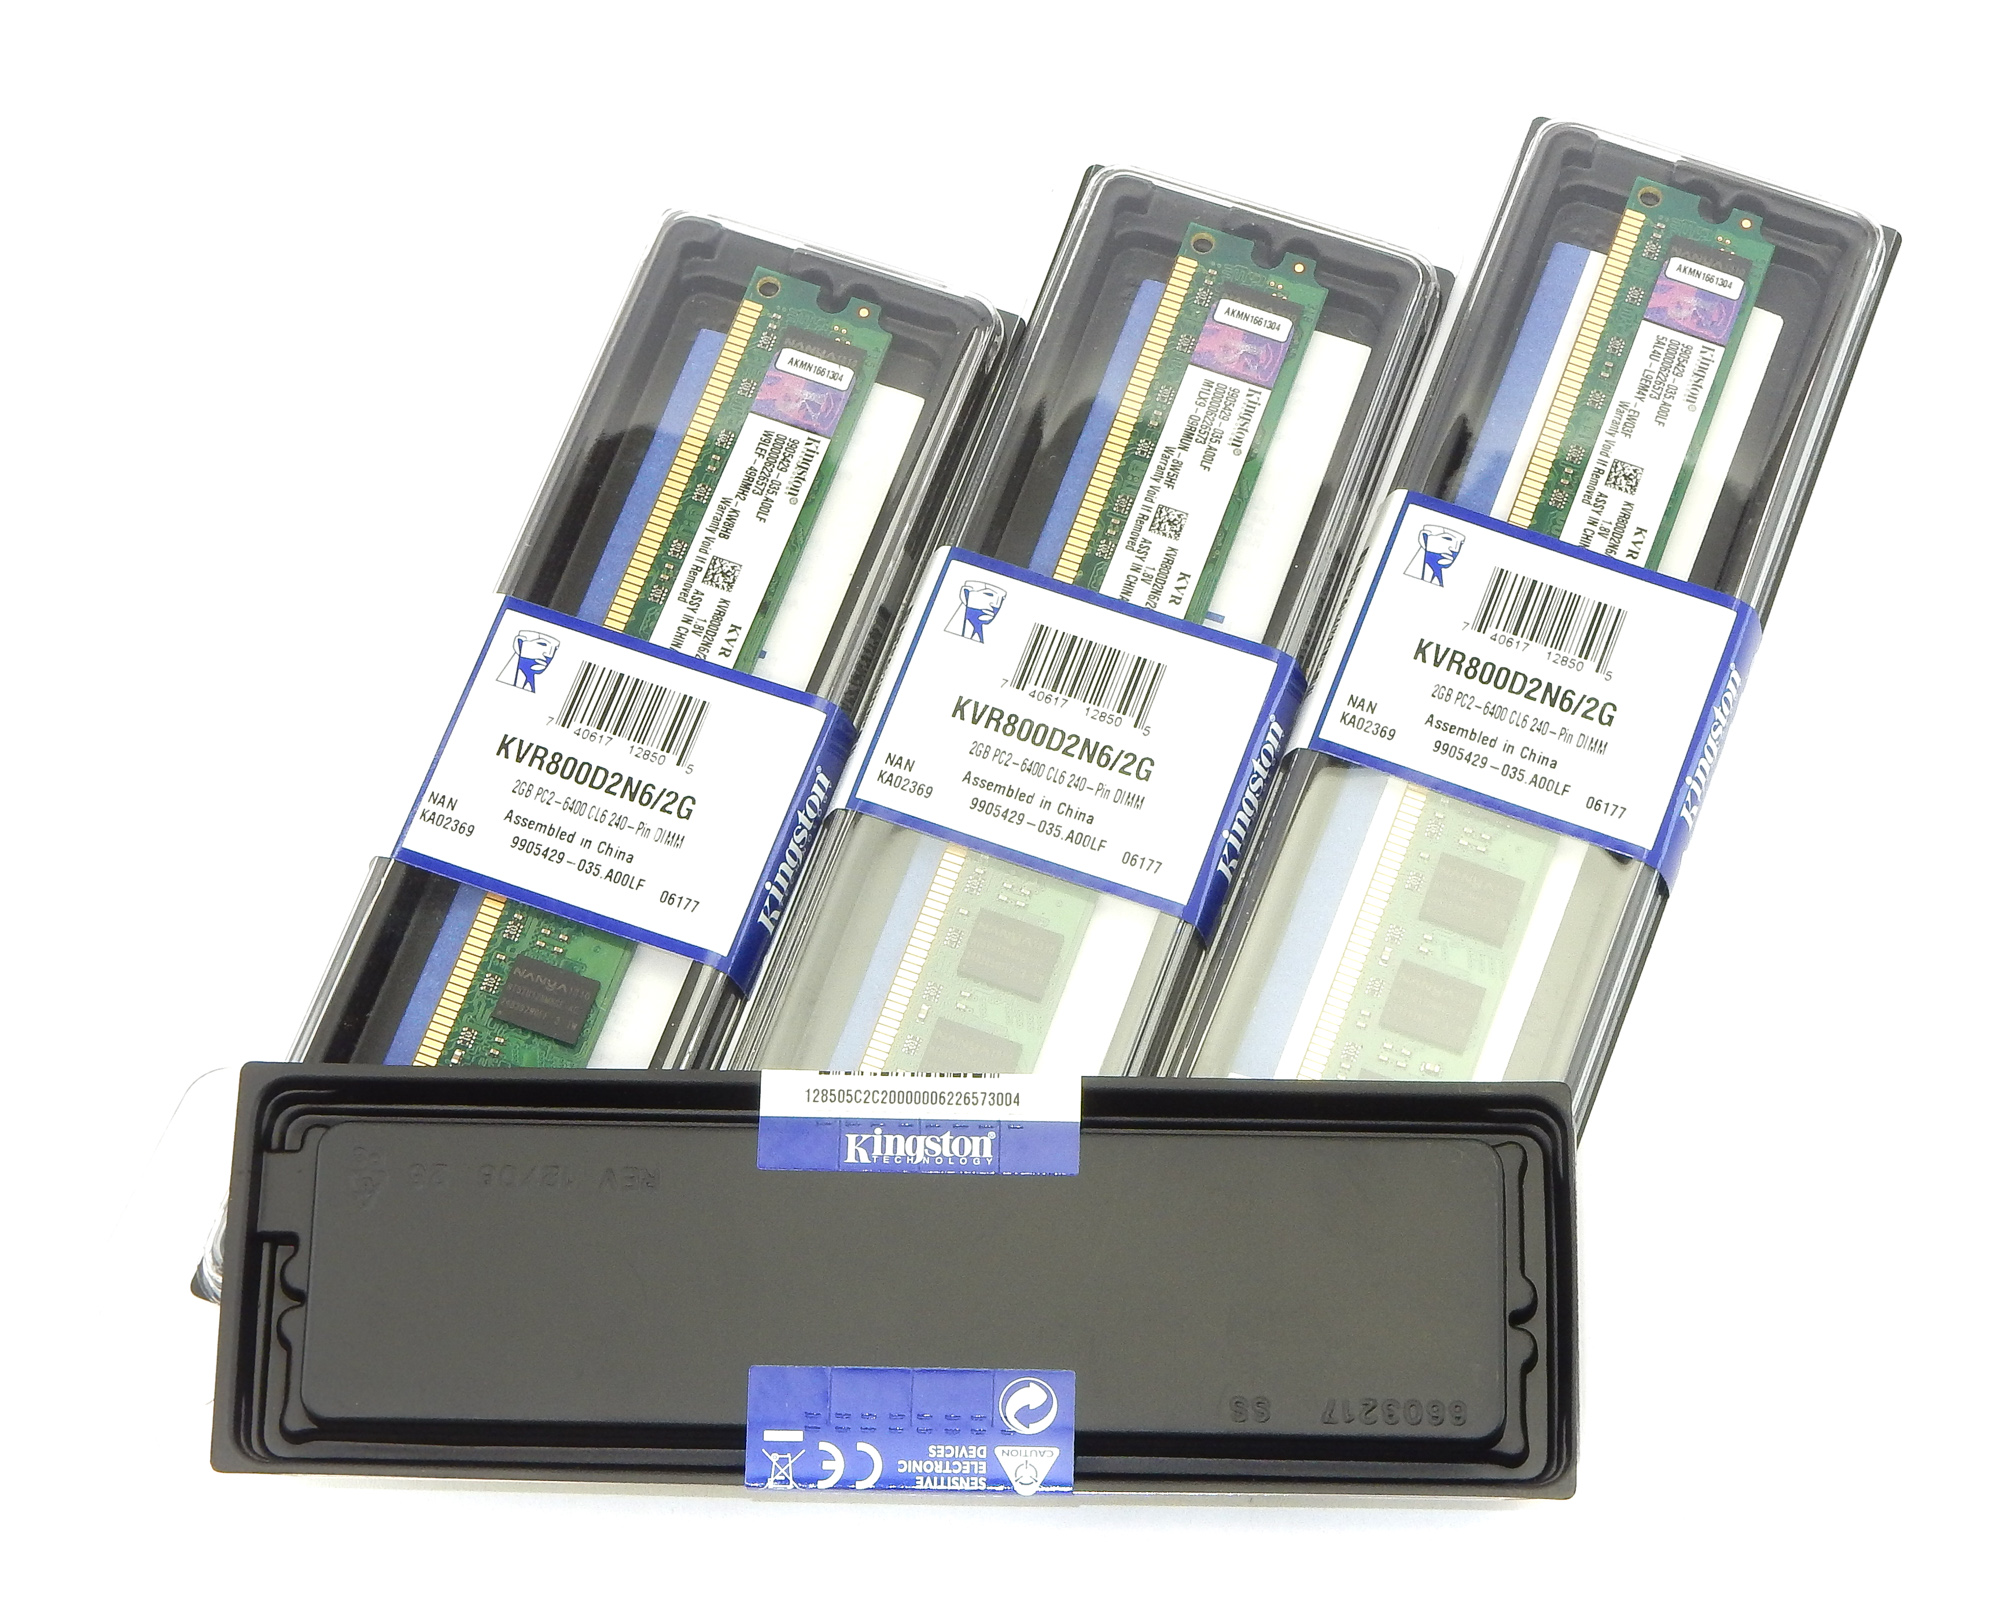 4x NEW Kingston KVR800D2N6/2G 2GB DDR2 Low Profile Desktop RAM PC2-6400 240pin